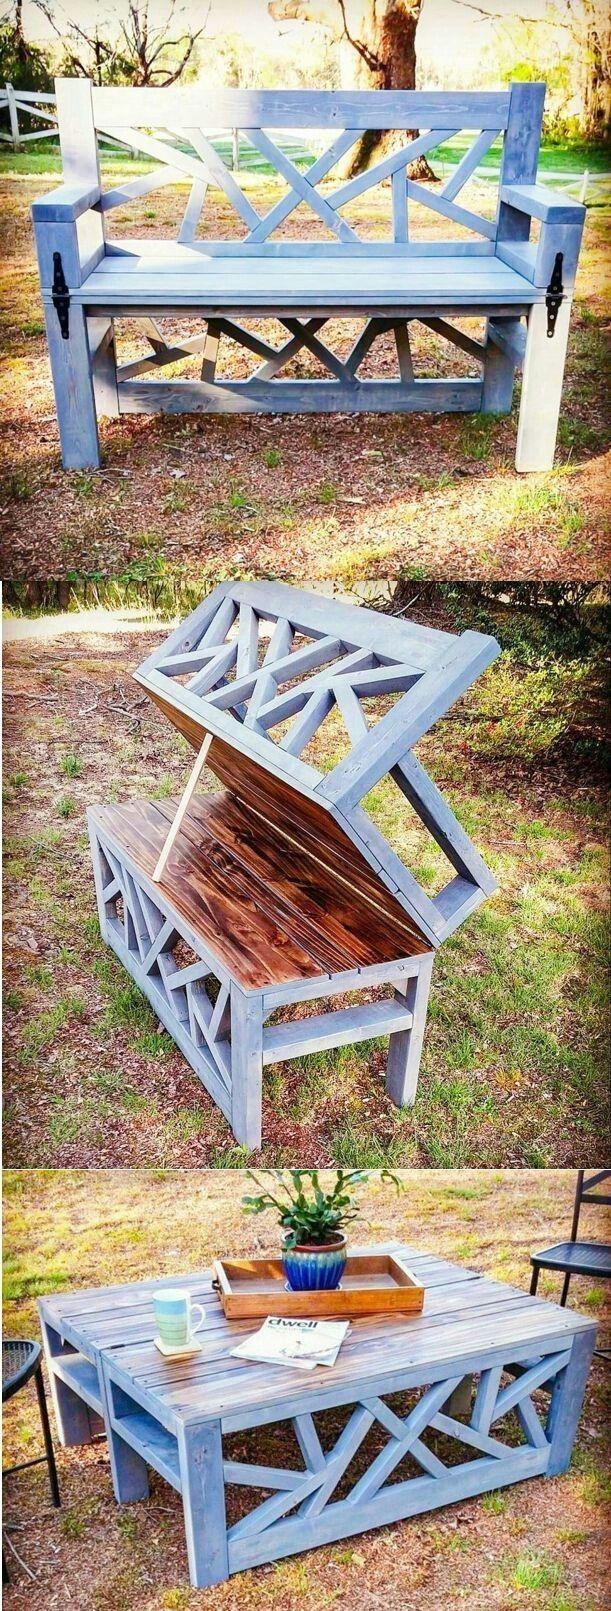 Bench into table #WoodworkingBench #diyfurniturerepurpose